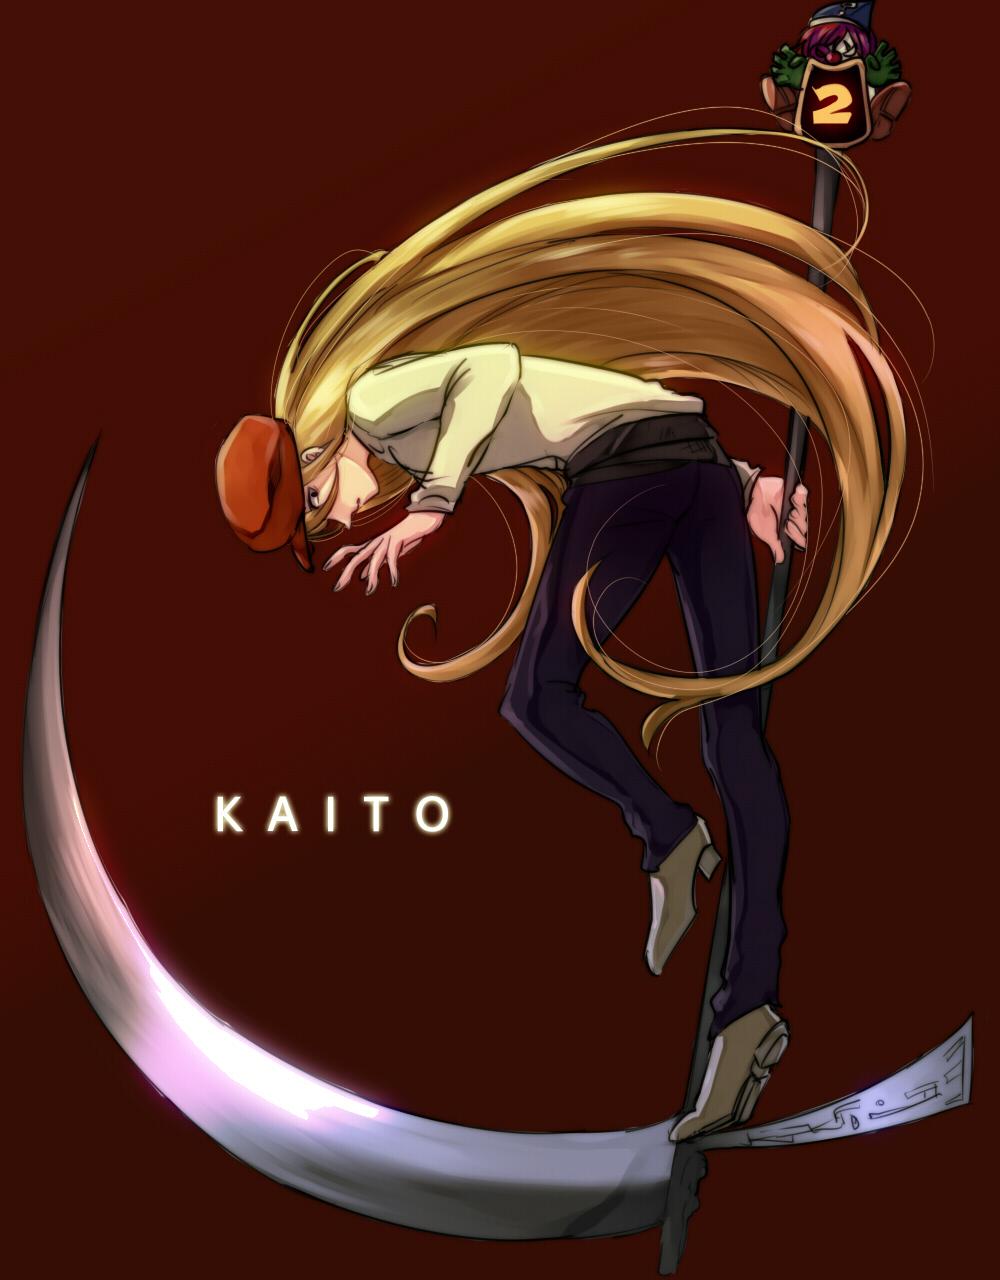 Kite (hunter x hunter) minimalist wallpaper. Kite (Hunter x Hunter), Fanart   page 2 - Zerochan Anime ...